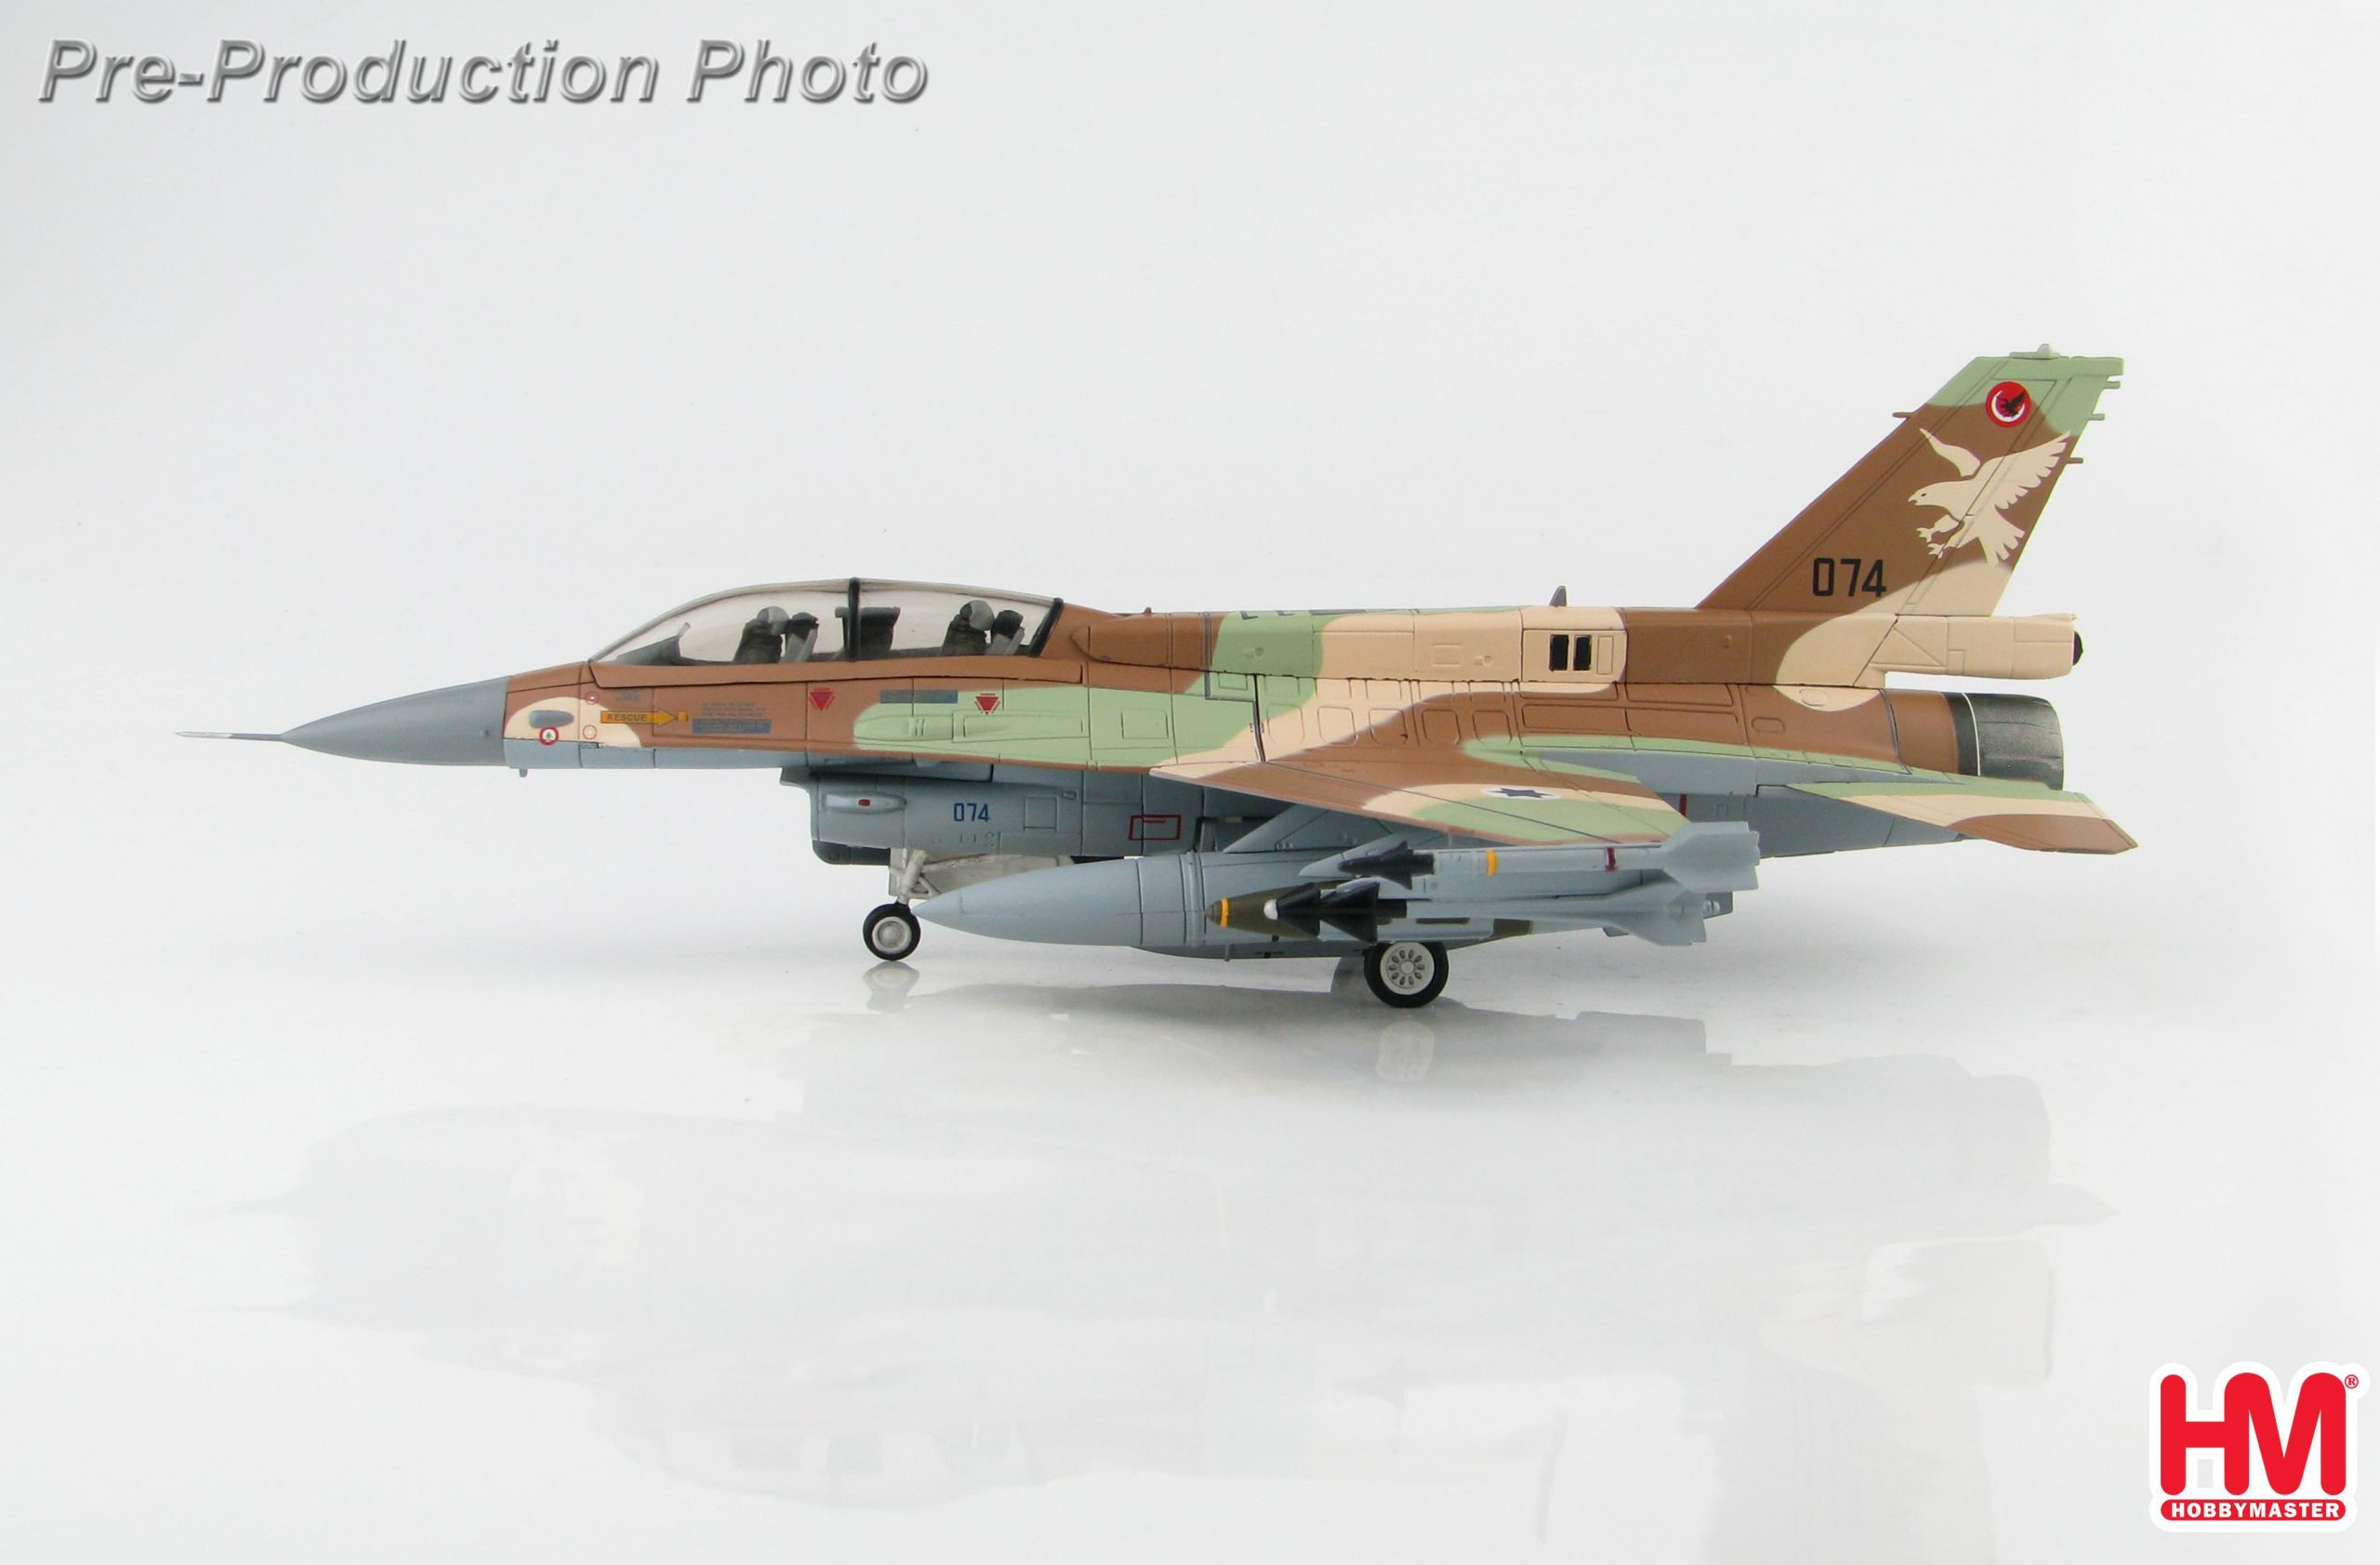 HOBBY MASTER HA3873 1//72 F-16D BARAK UAV KILLER 074 109 SQUADRON ISRAELI AF 2006